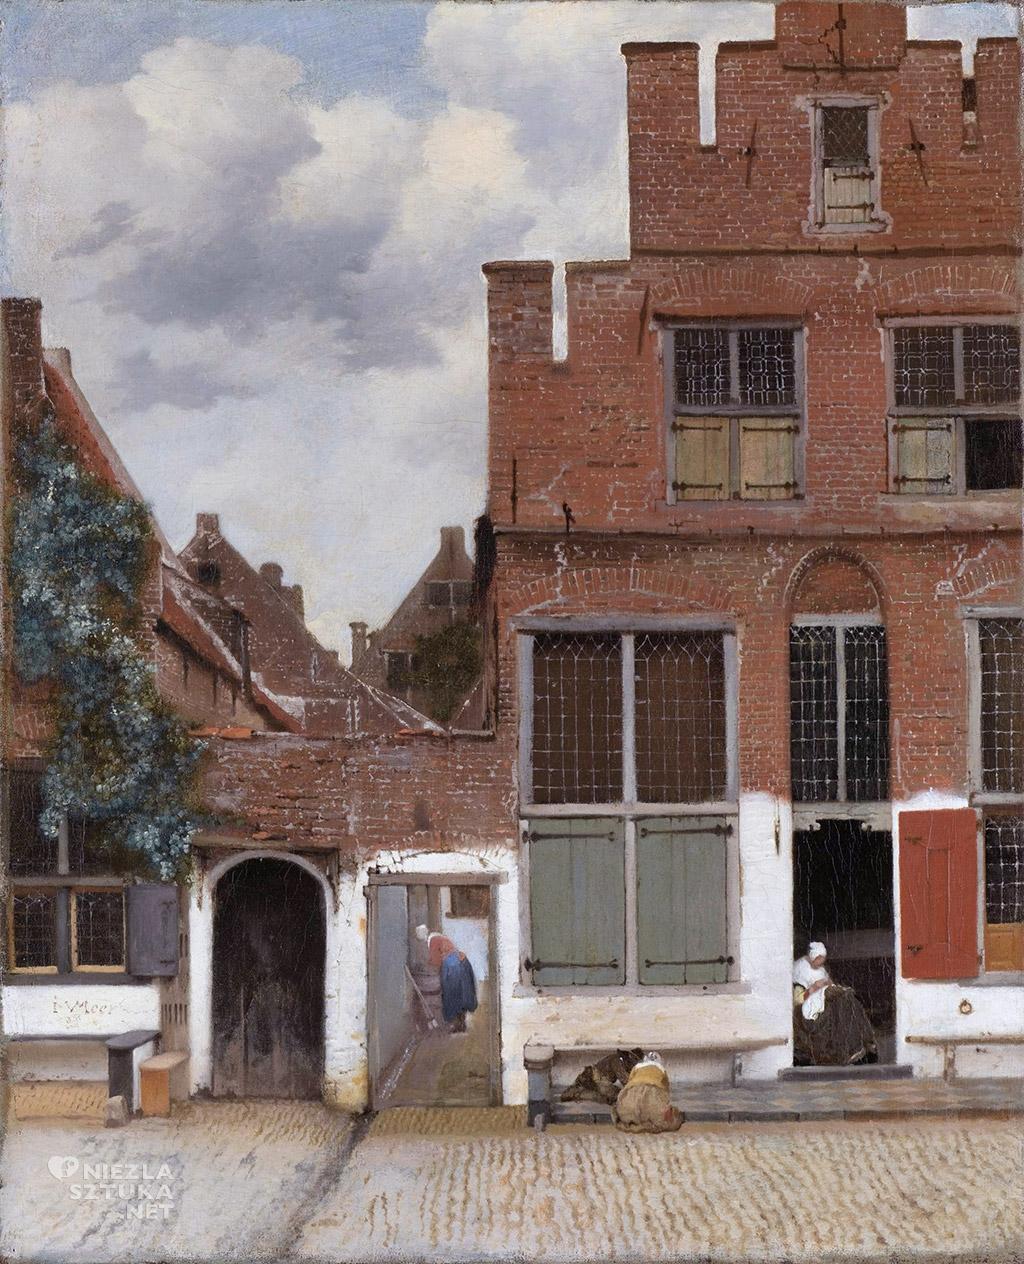 Johannes Vermeer, Uliczka, Niezła sztuka